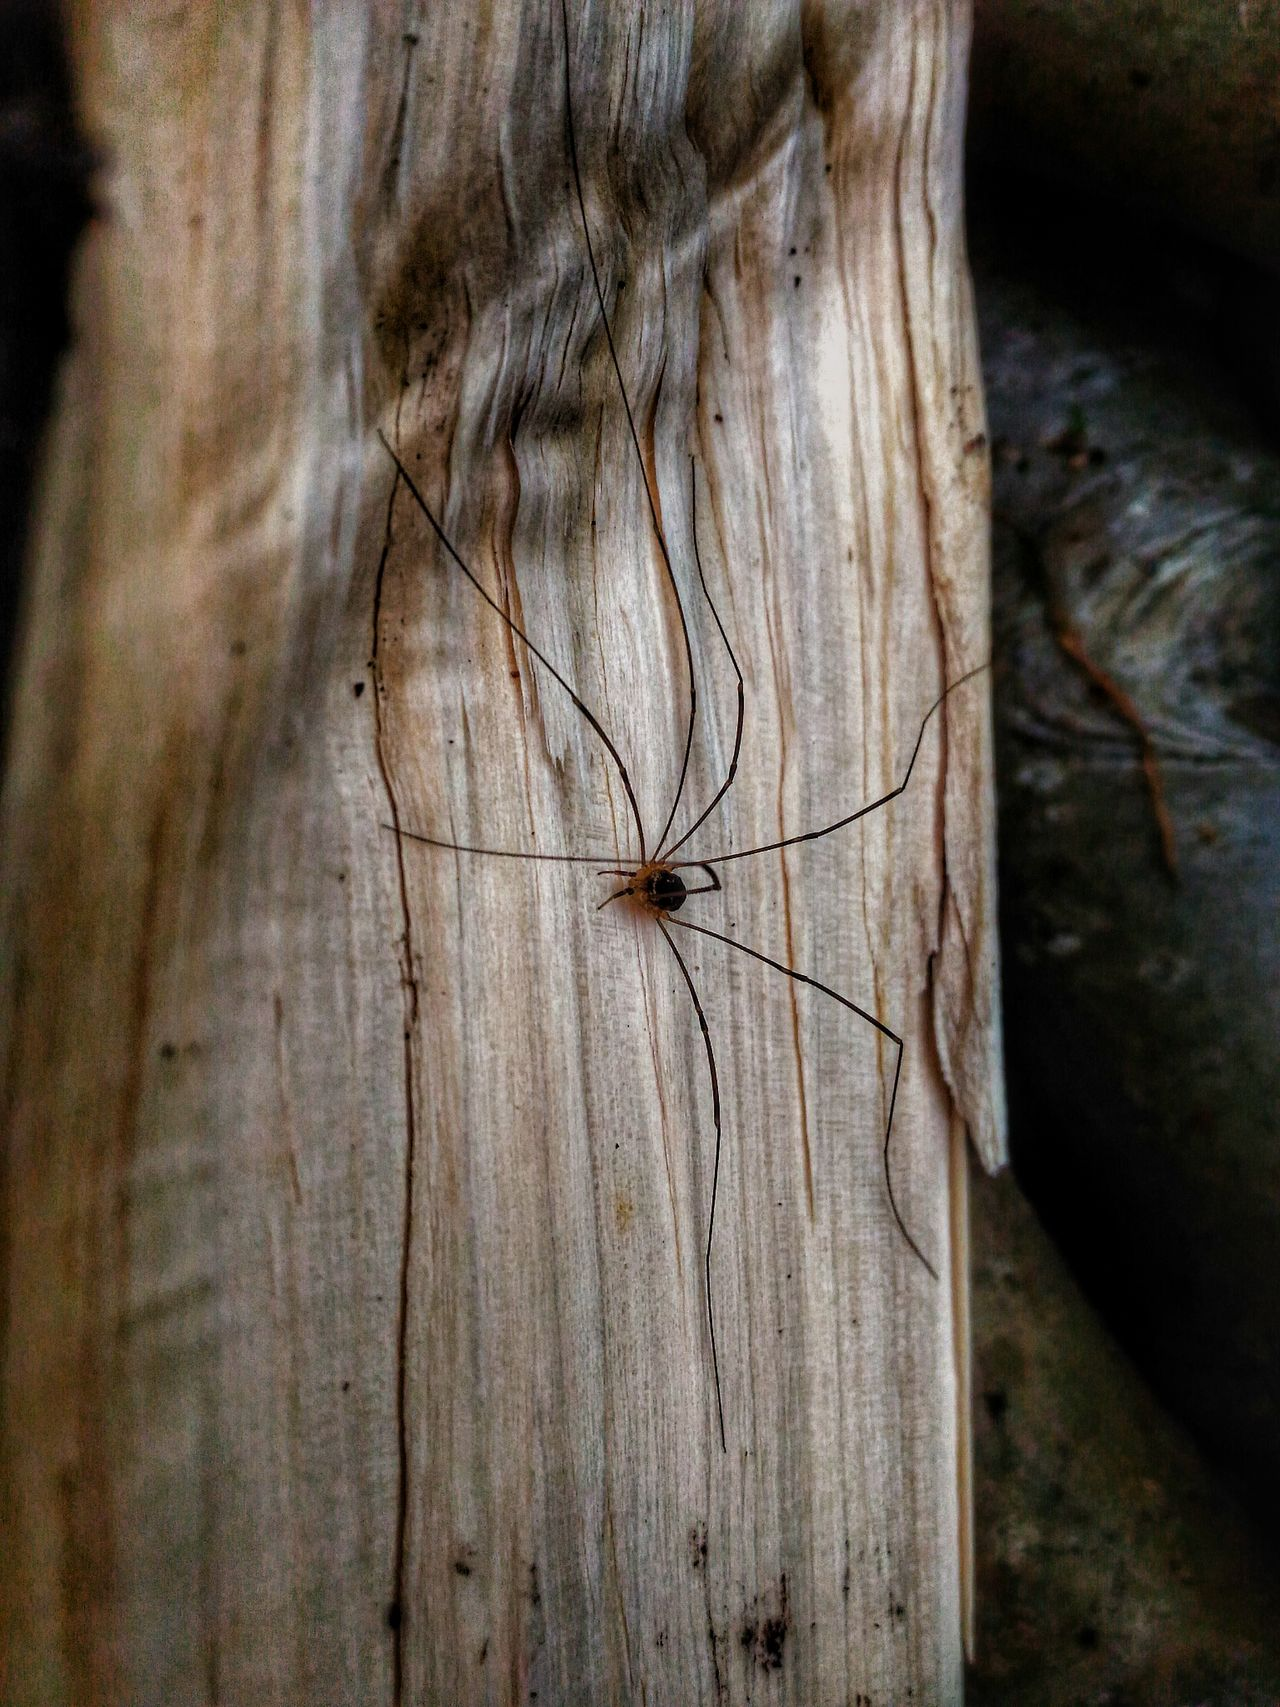 Spider Woodlander паук Zenphotography Ze601kl Mobilephotography